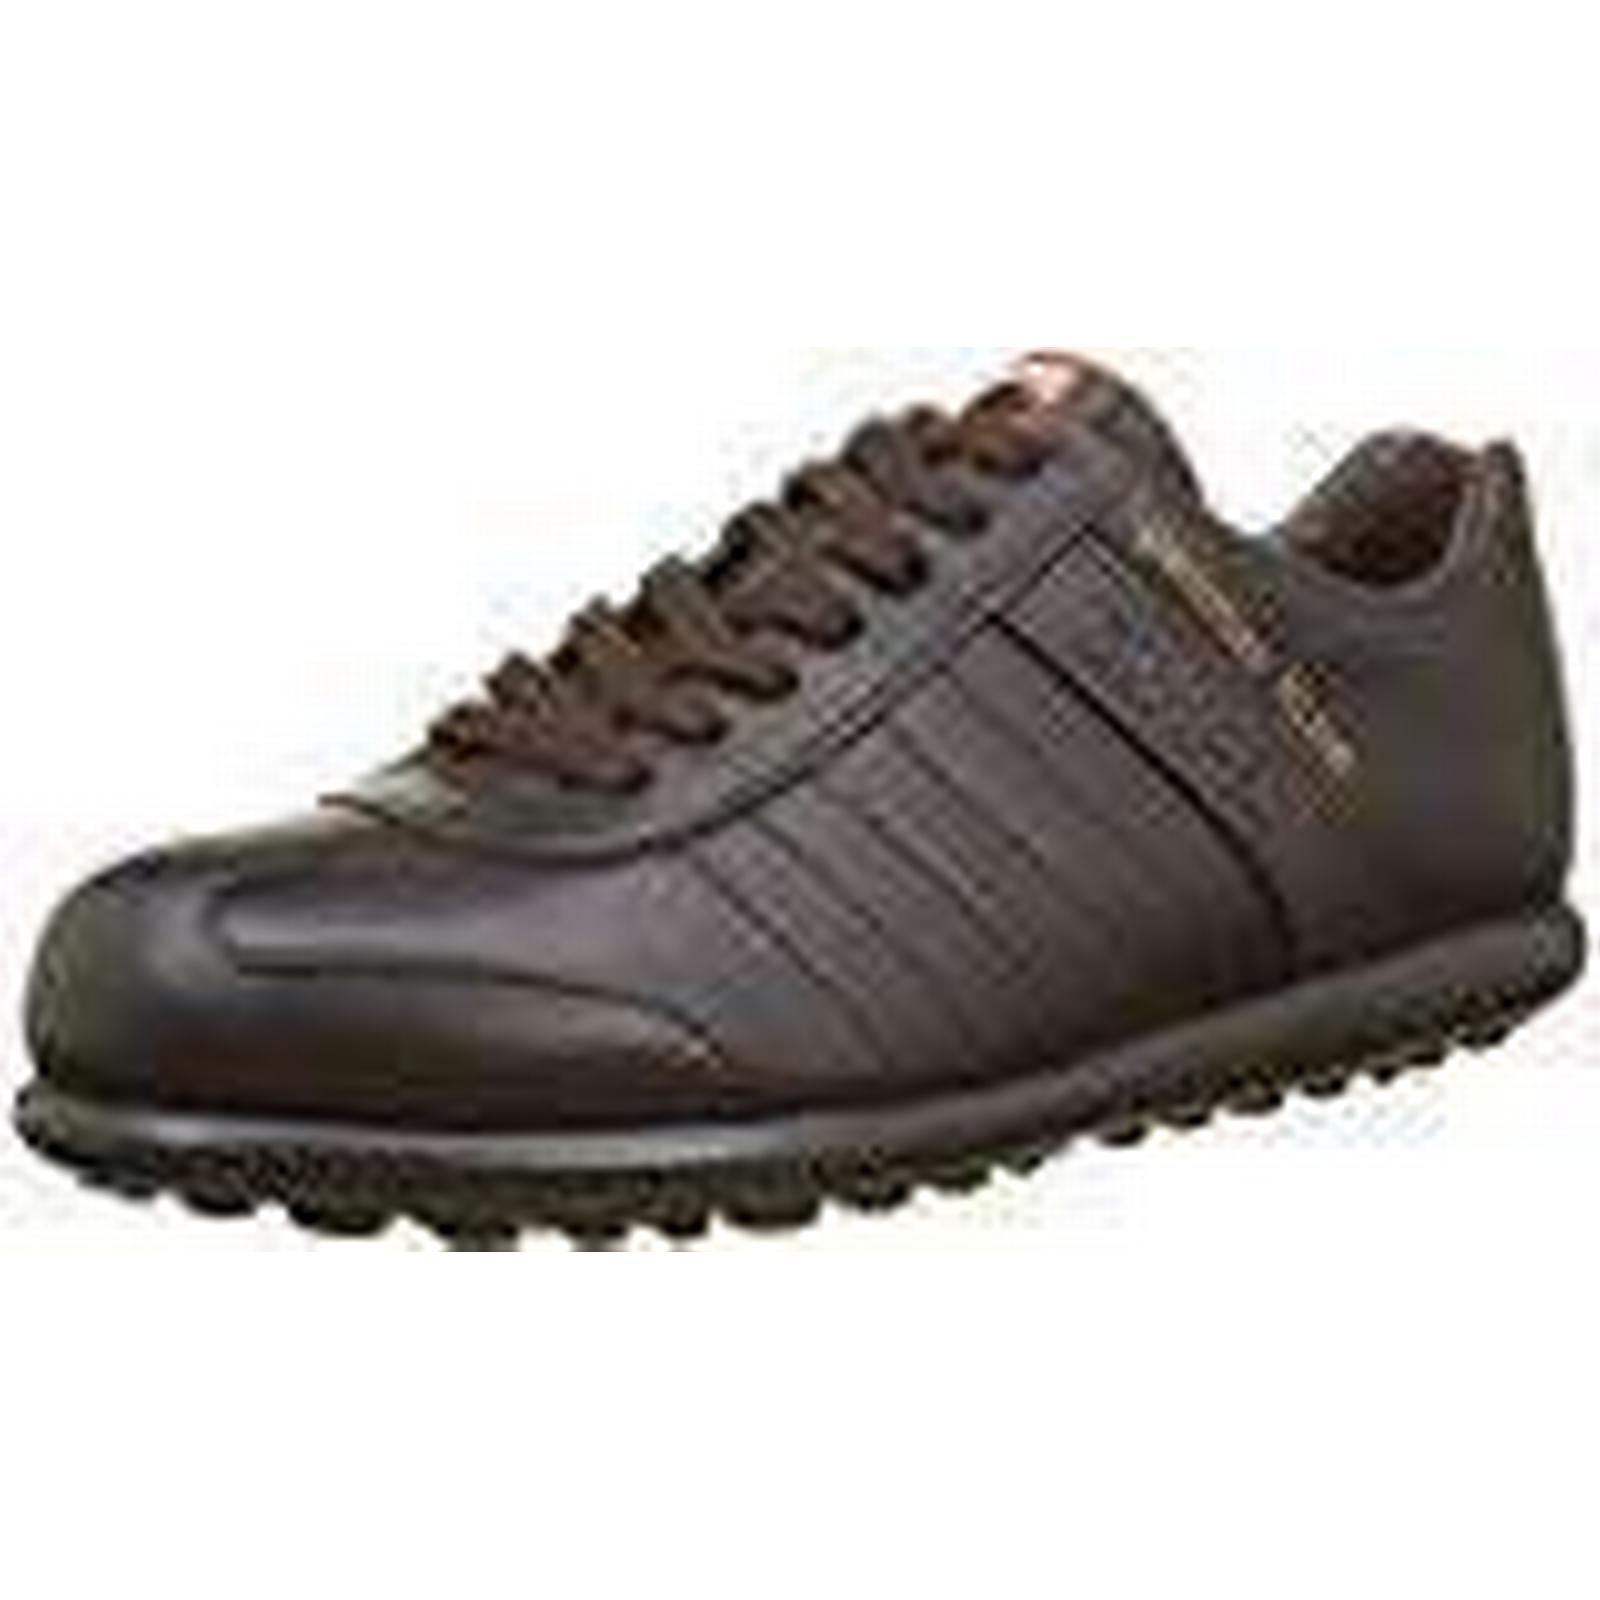 Camper Pelotas Xl, Men's 7 Sneakers, Brown (Dark Brown 025), 7 Men's UK 971926